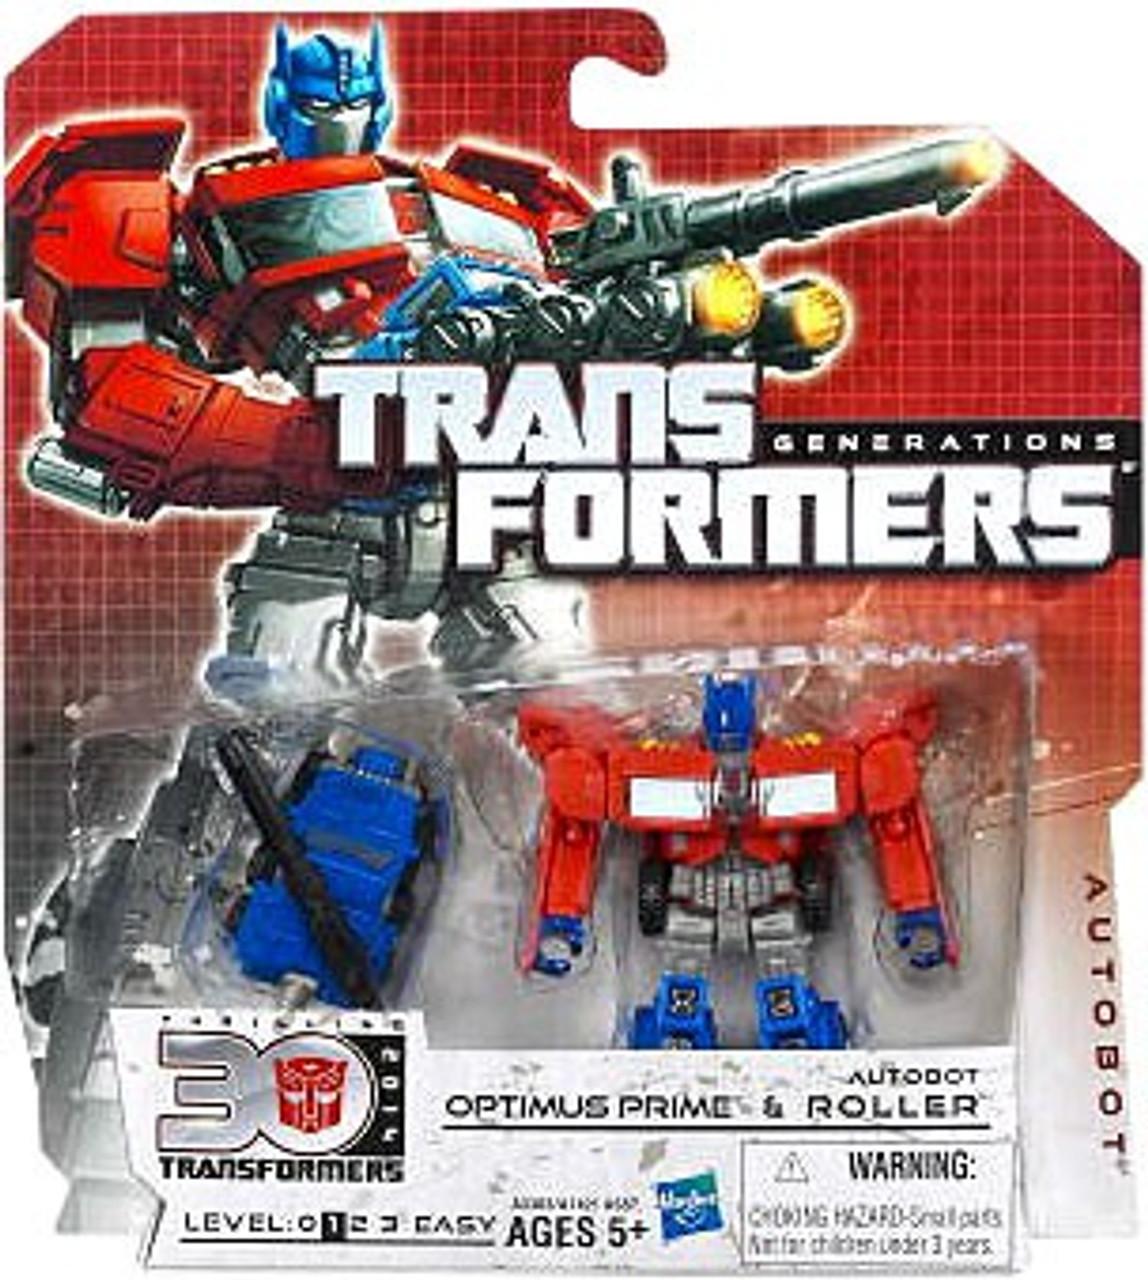 Transformers Generations 30th Anniversary Legends Optimus Prime & Autobot Roller Legend Action Figure 2-Pack